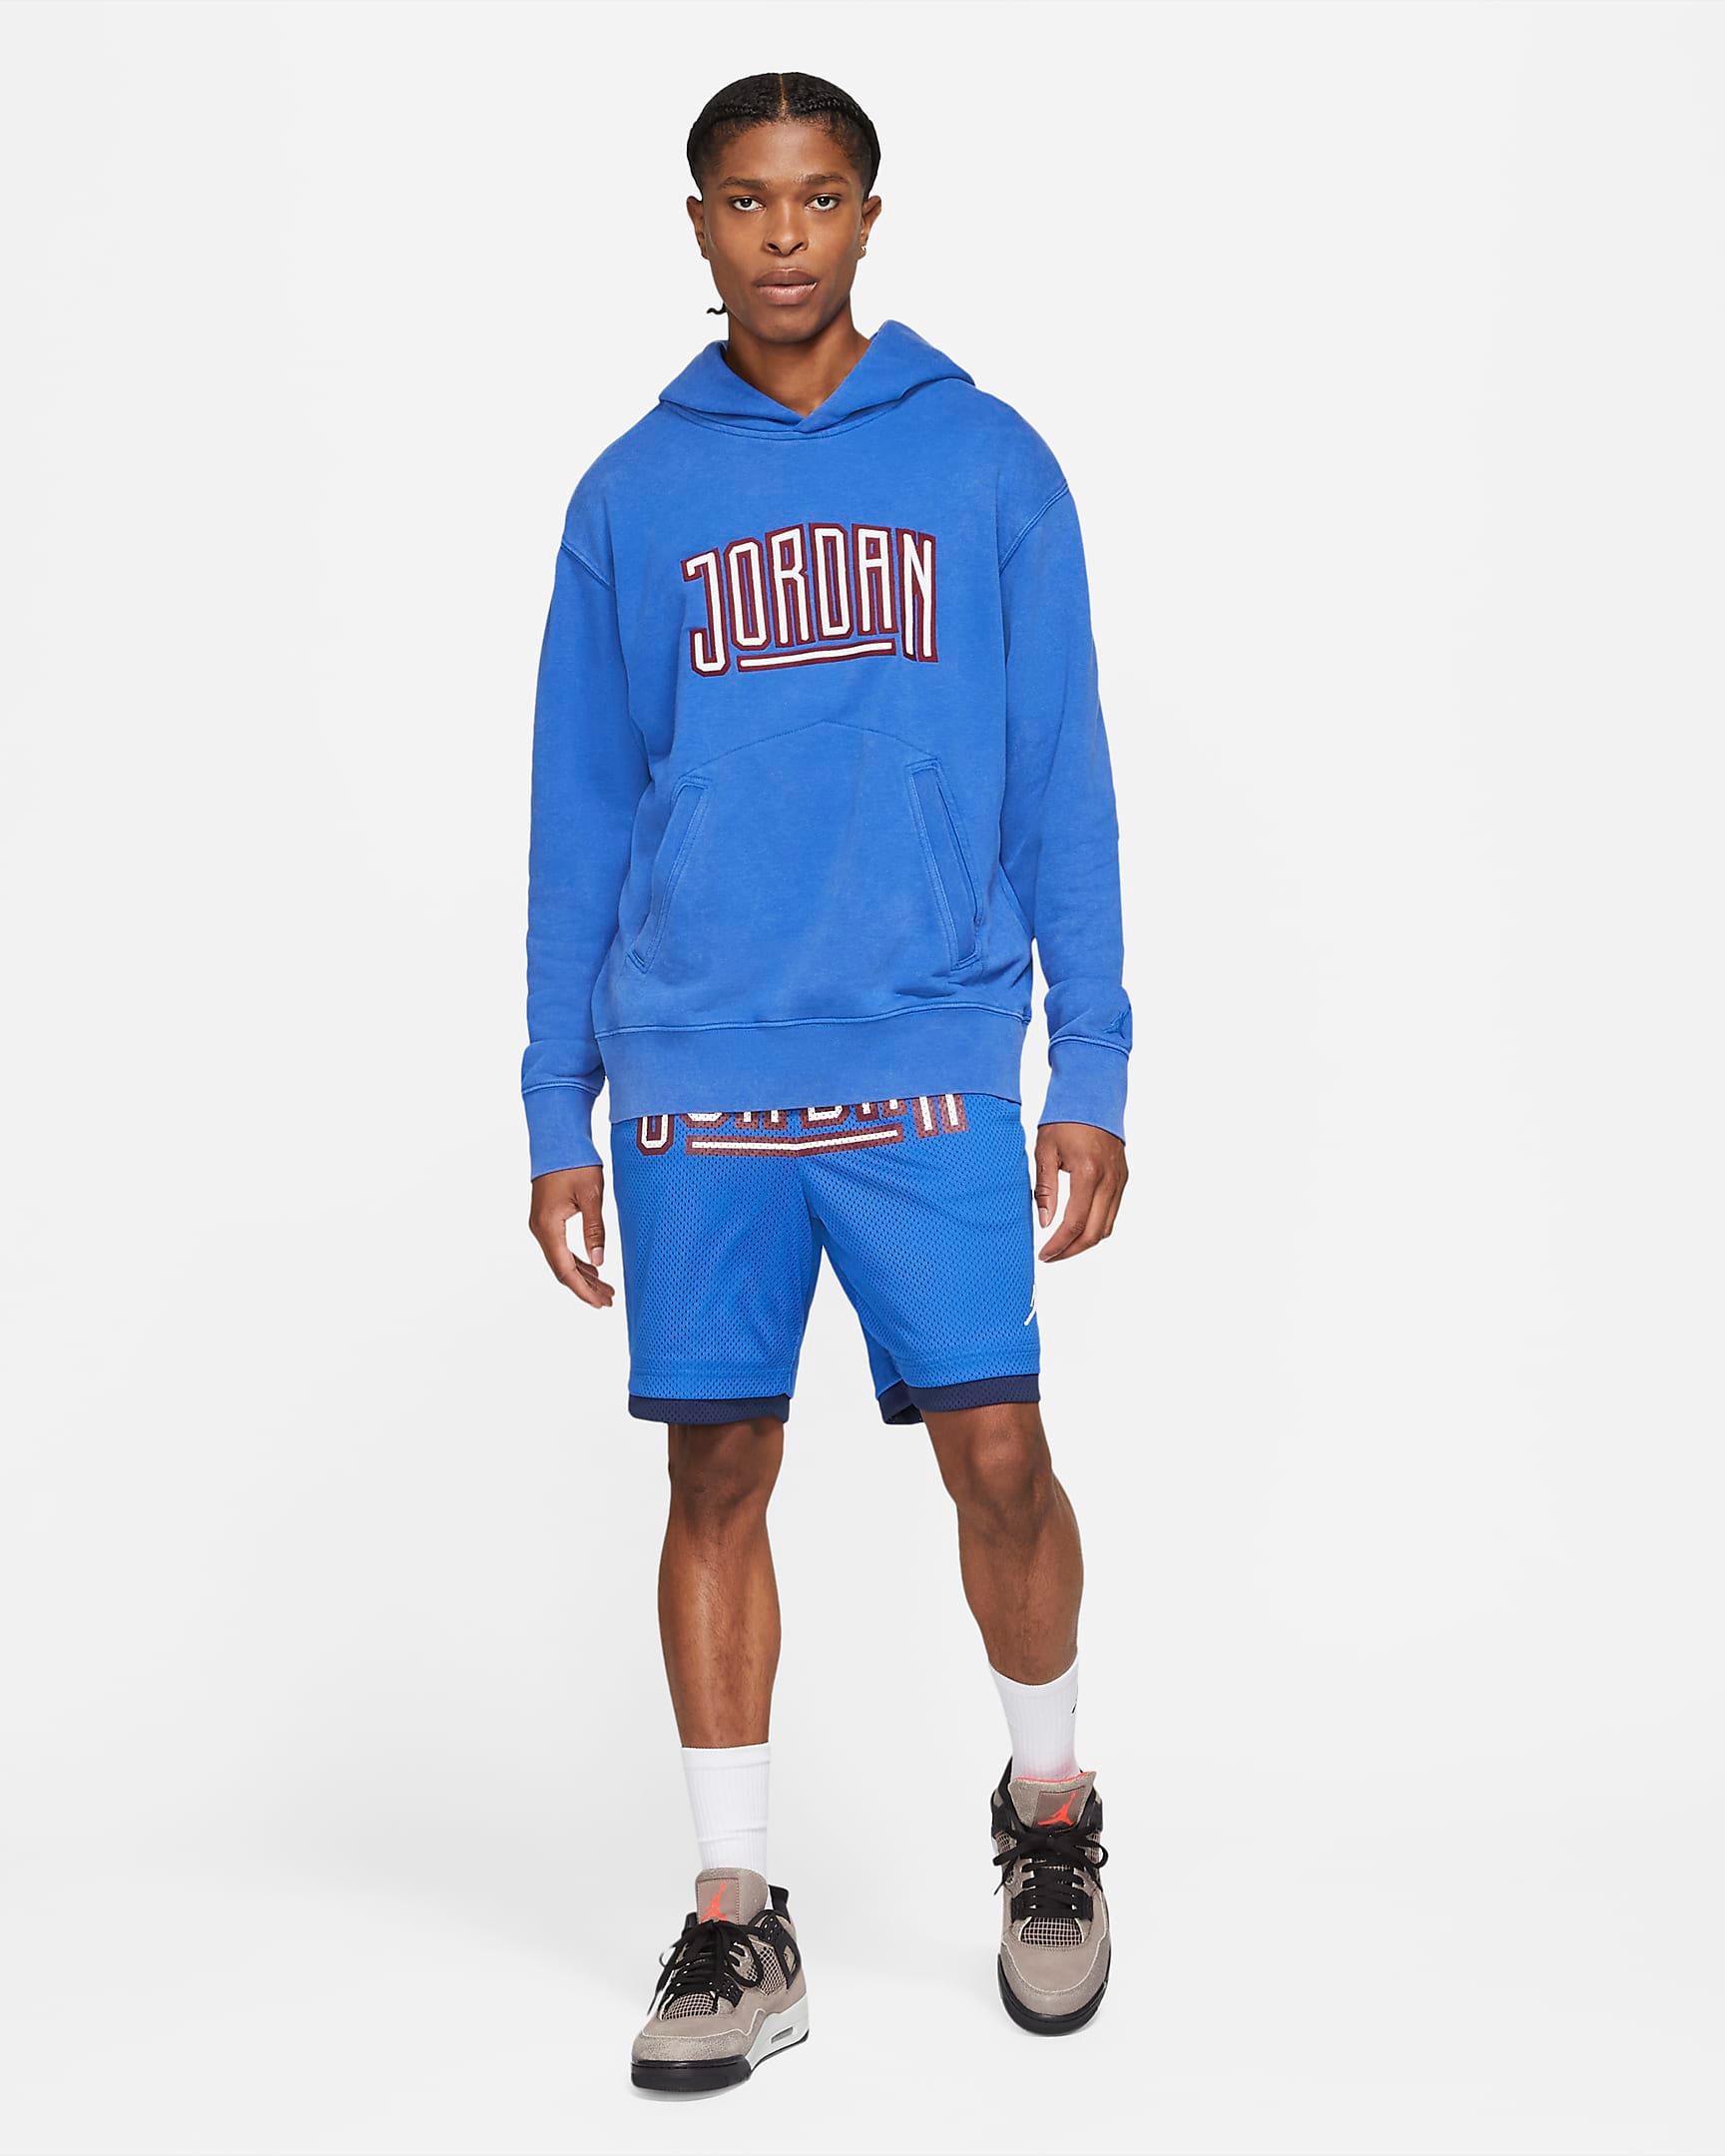 jordan-game-royal-sport-dna-hoodie-shorts-outfit